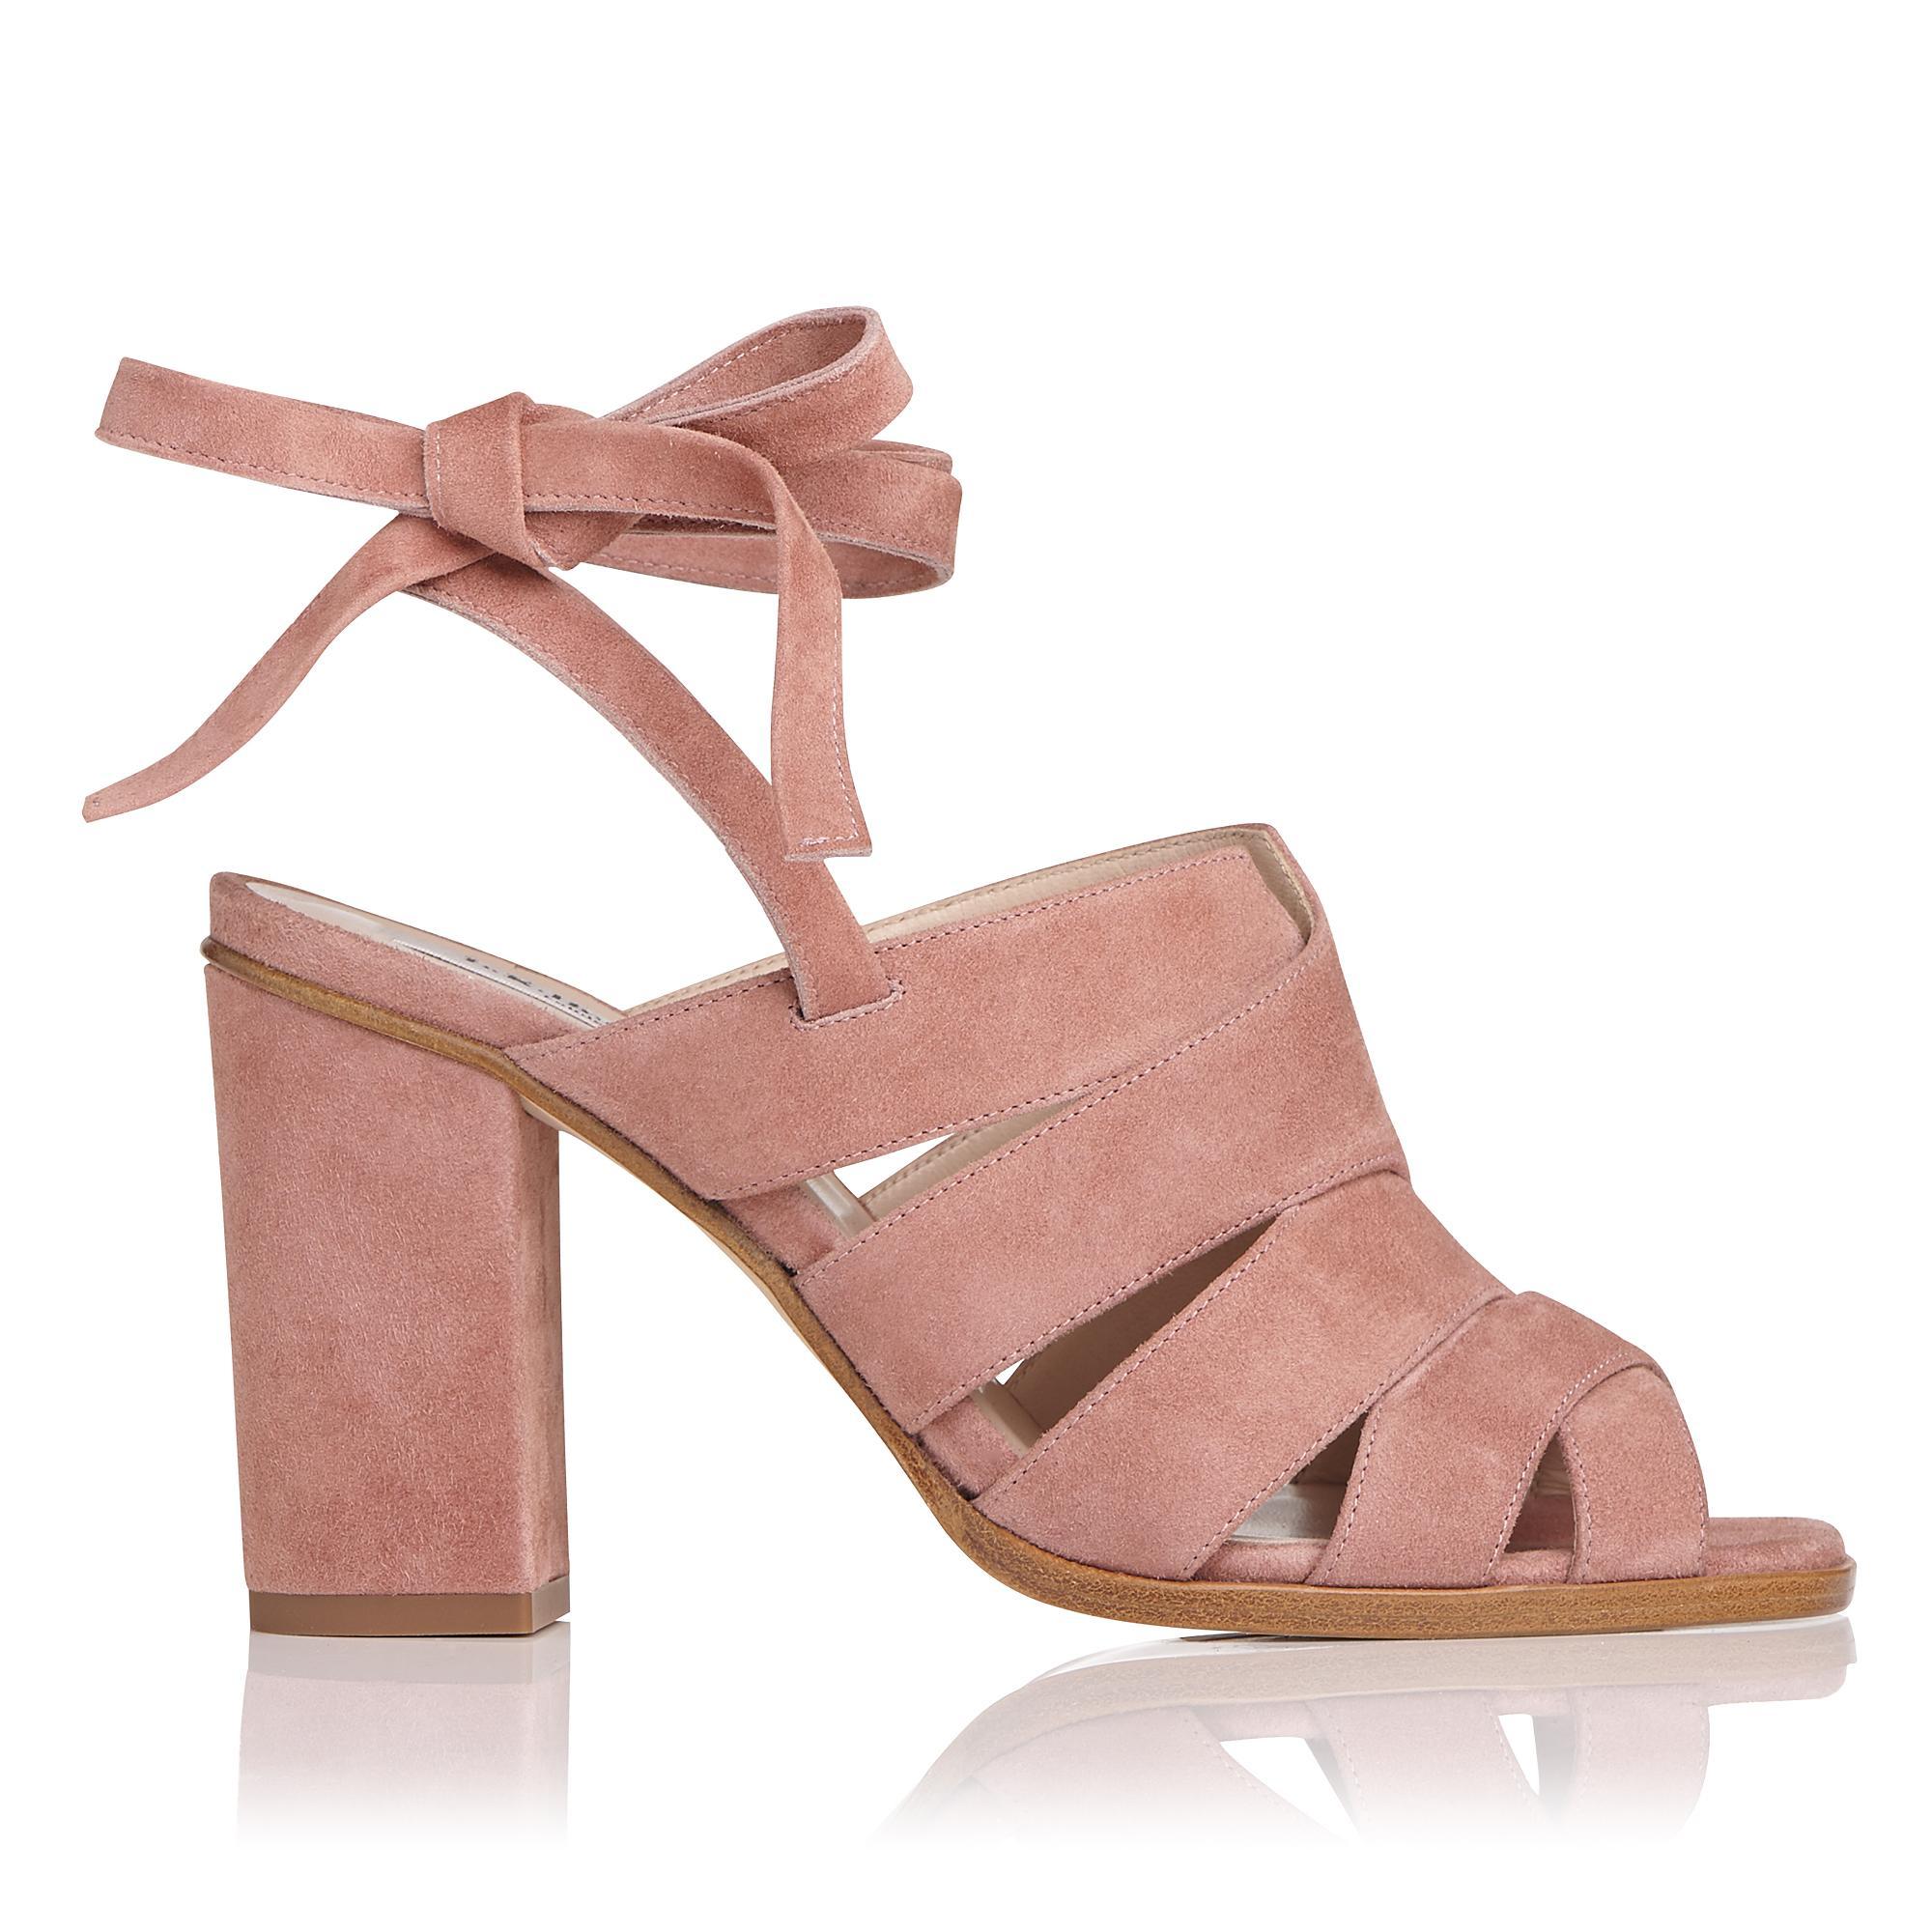 Seline Pink Suede Sandal